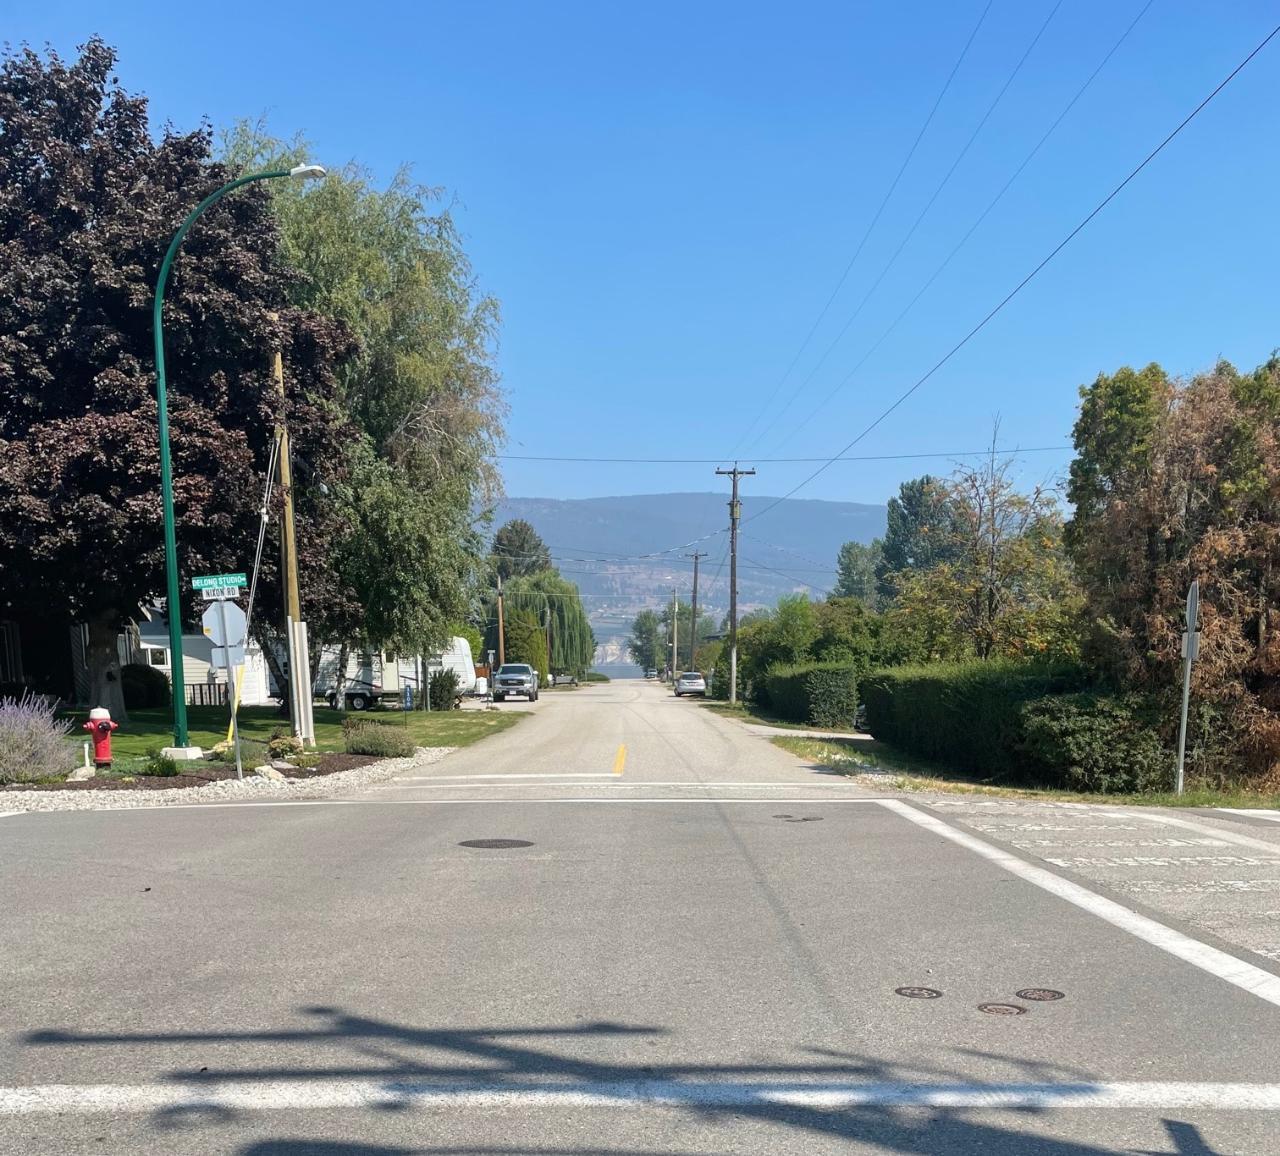 5586 Nixon Road,, Summerland, British Columbia  V0H 1Z9 - Photo 2 - 190915